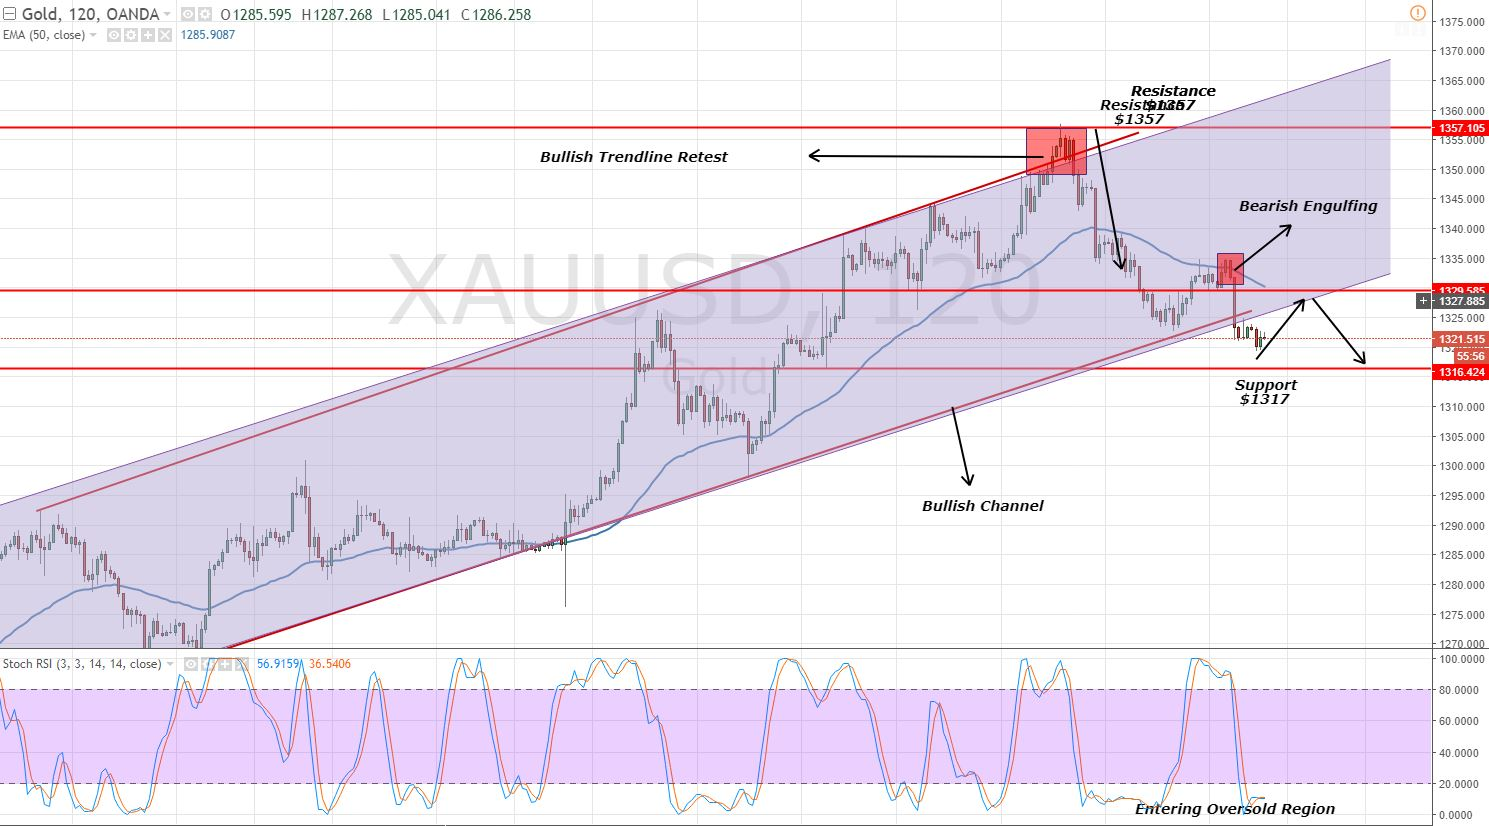 Gold - 2 Hour Chart - Bullish Channel Breakout